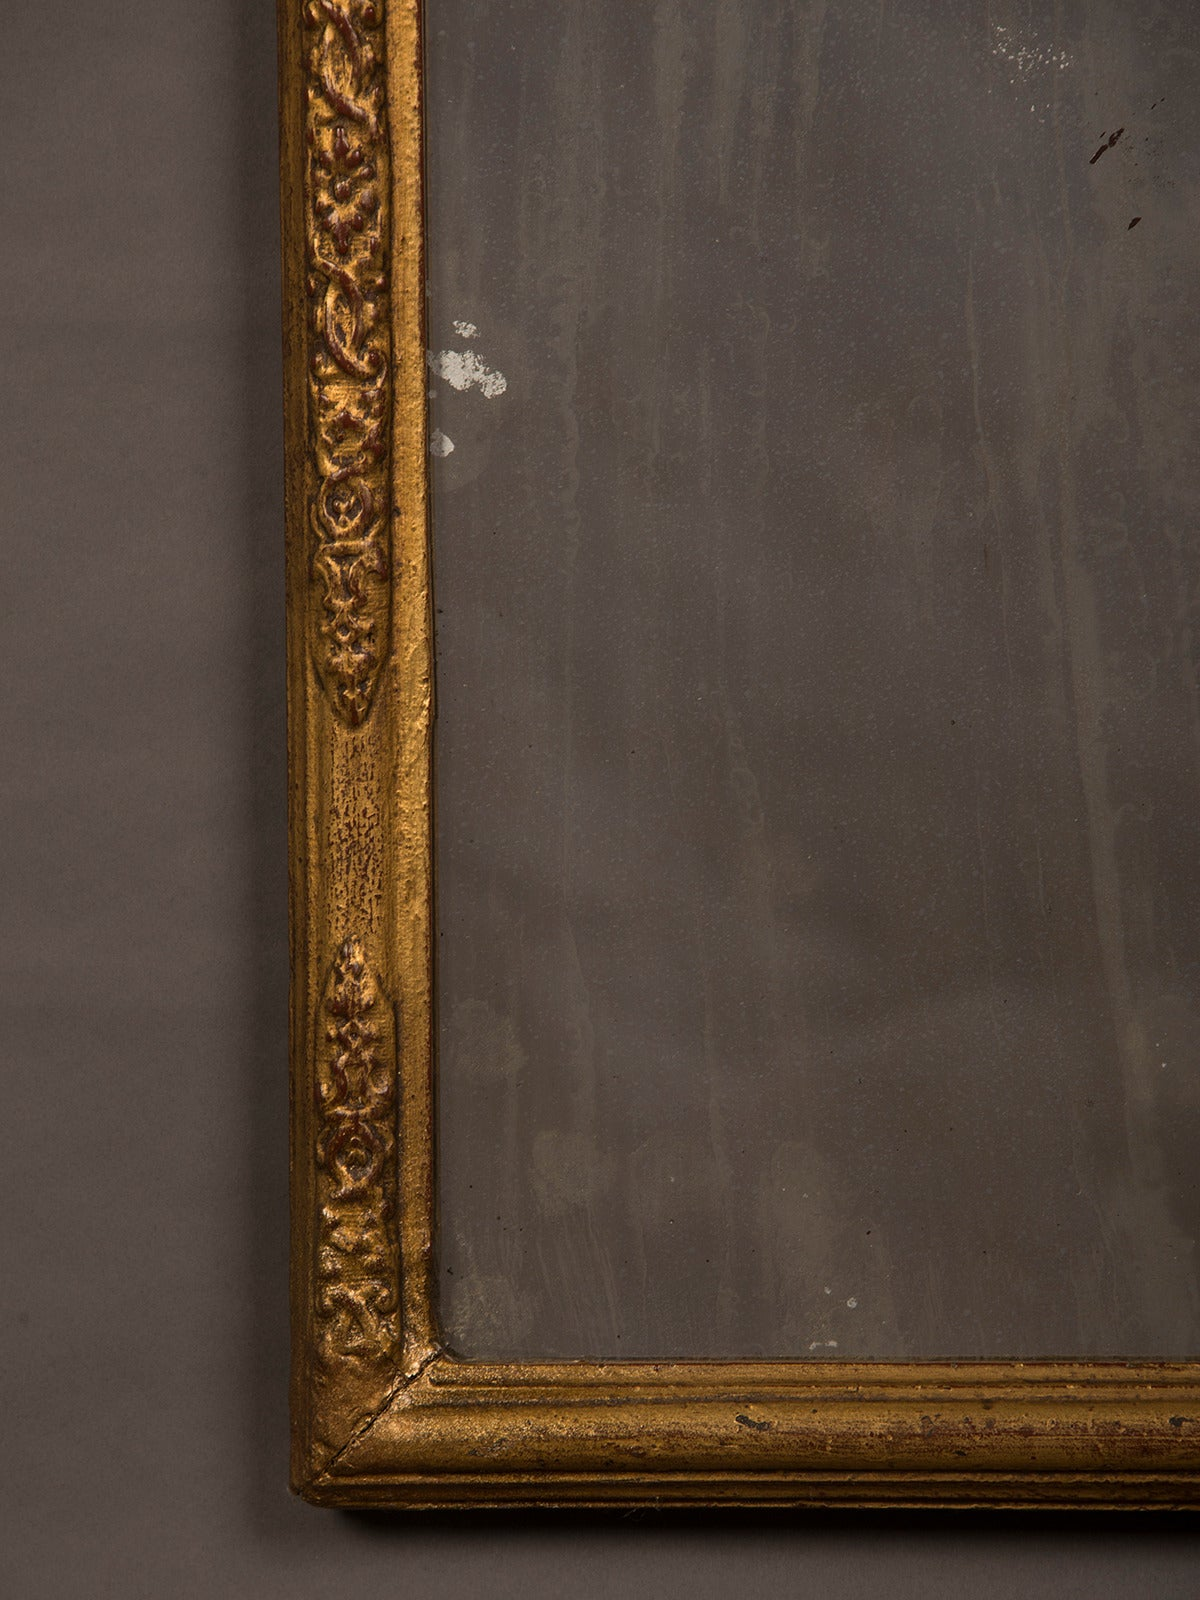 Gold Leaf Antique Italian Neoclassical Gilded Mirror, circa 1790 For Sale